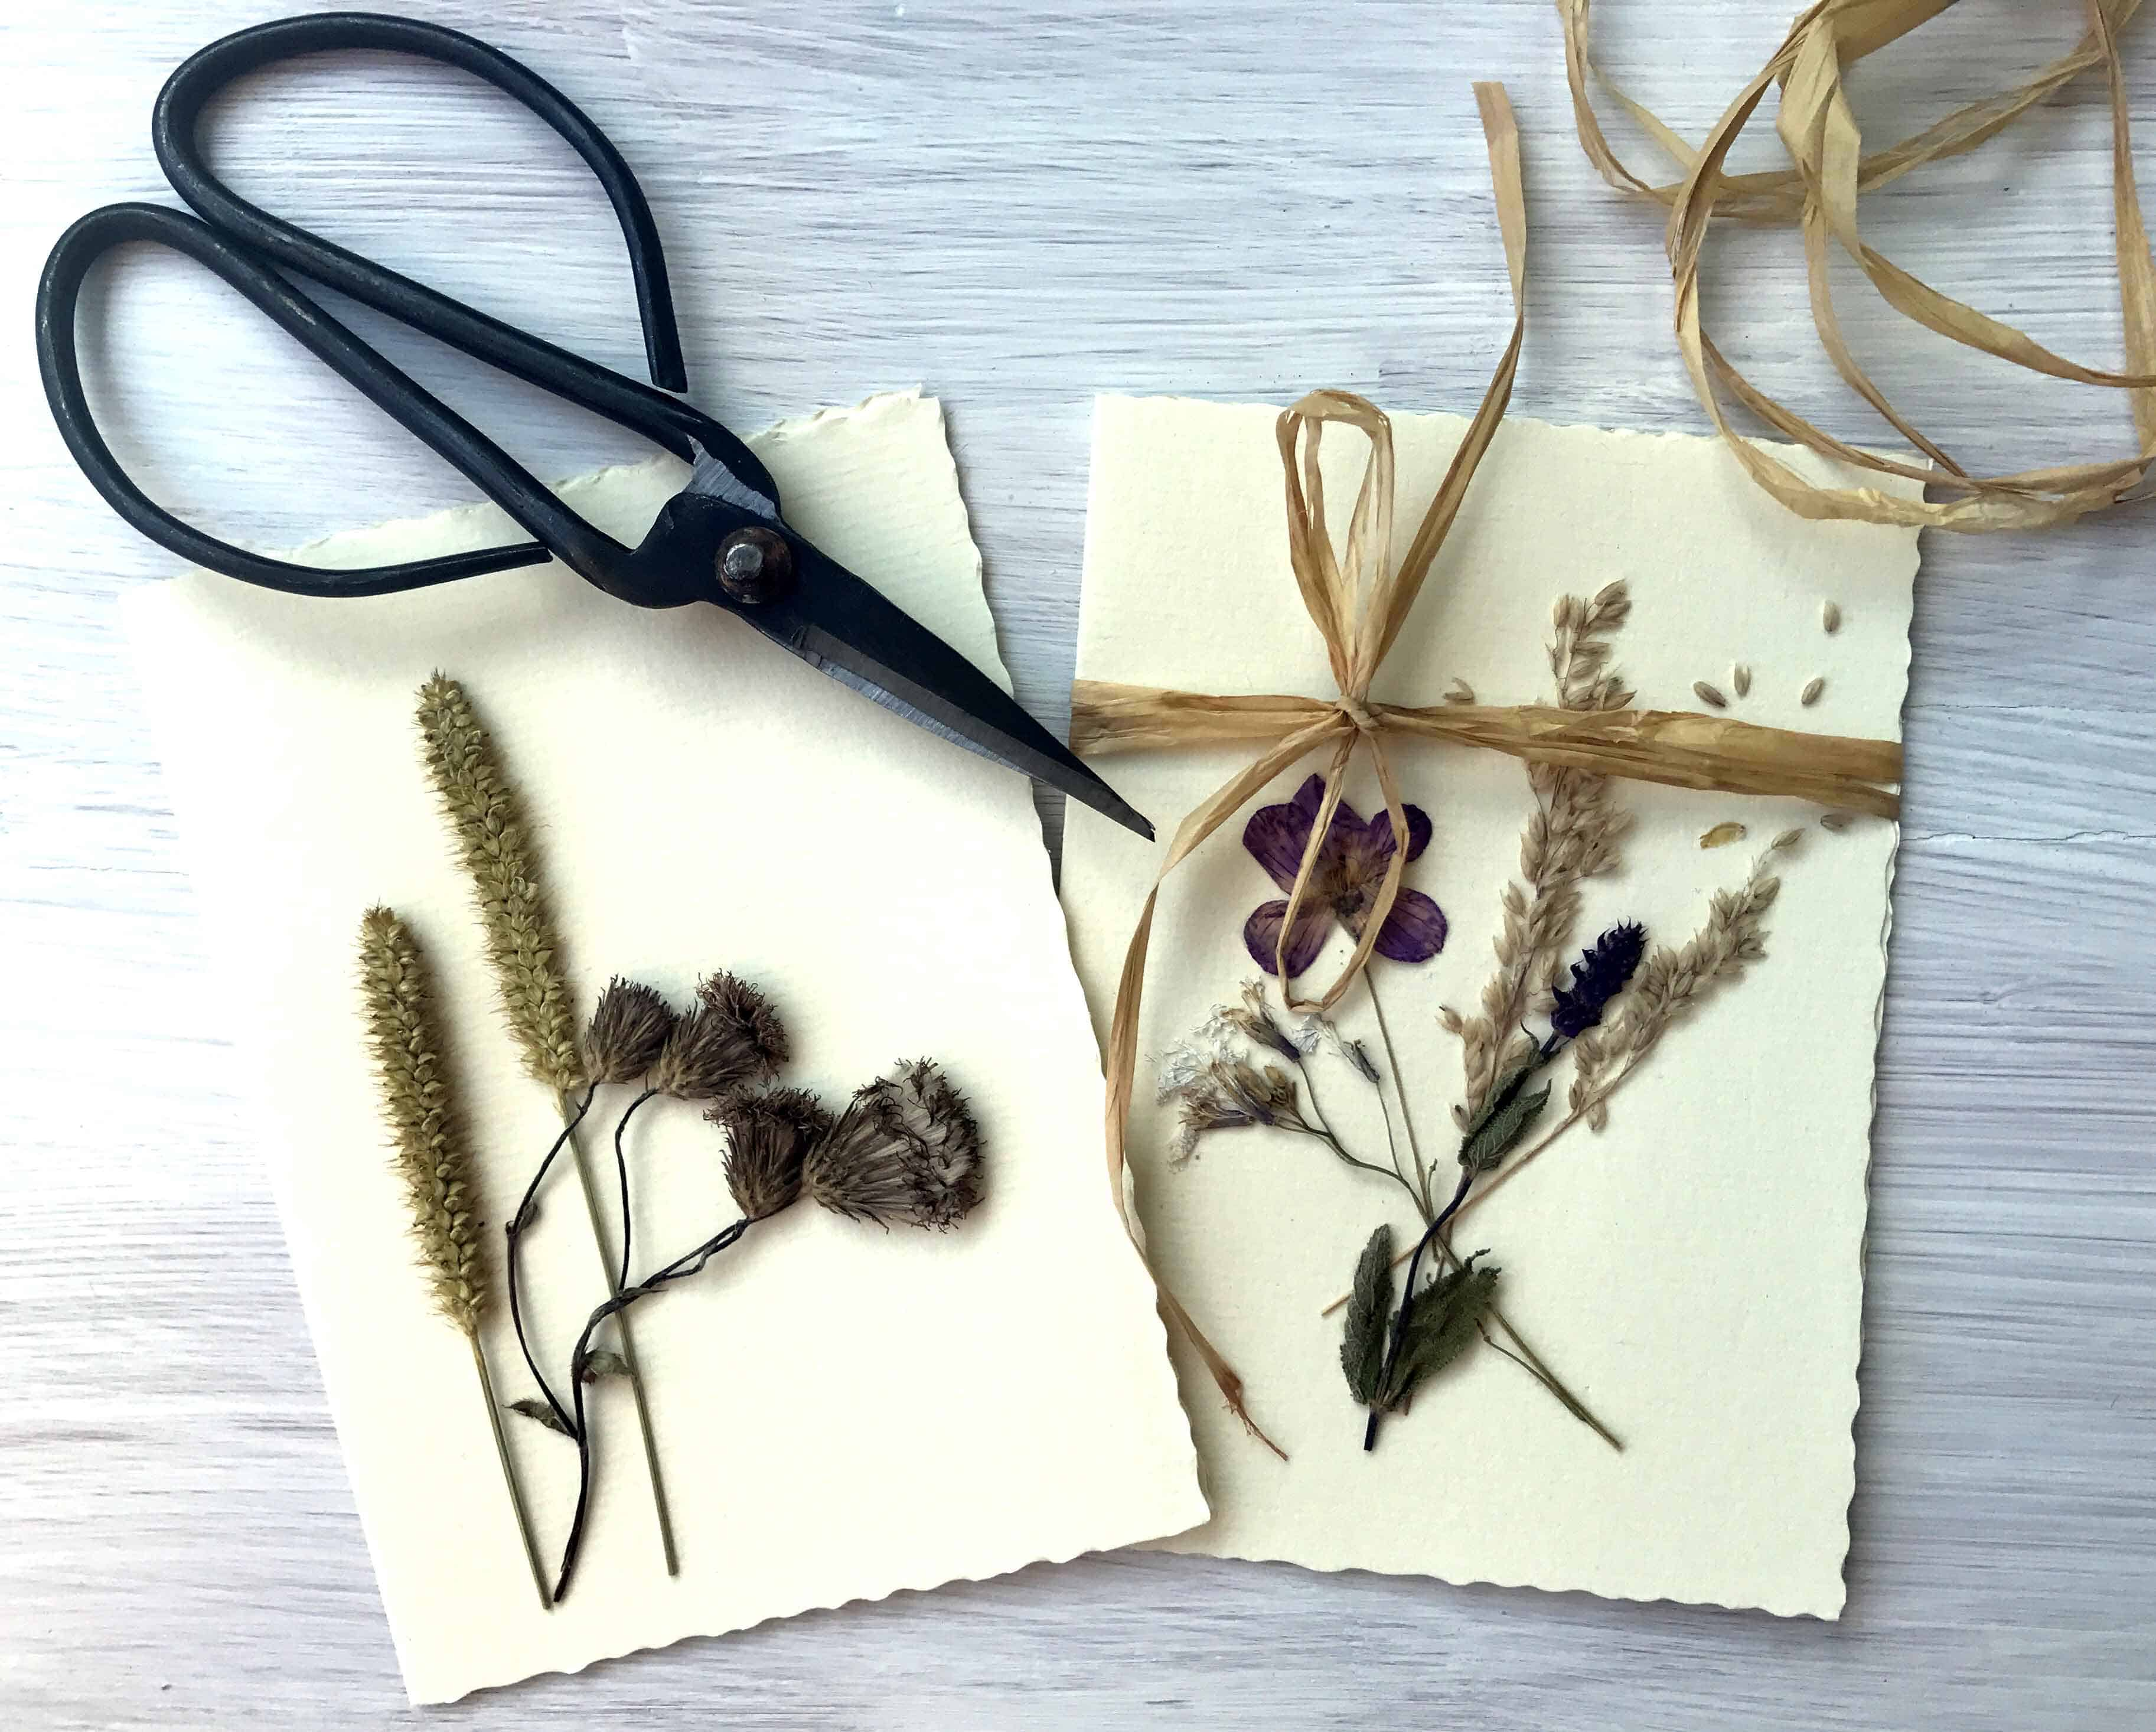 Fertige Grußkarte mit getrockneten Blumen